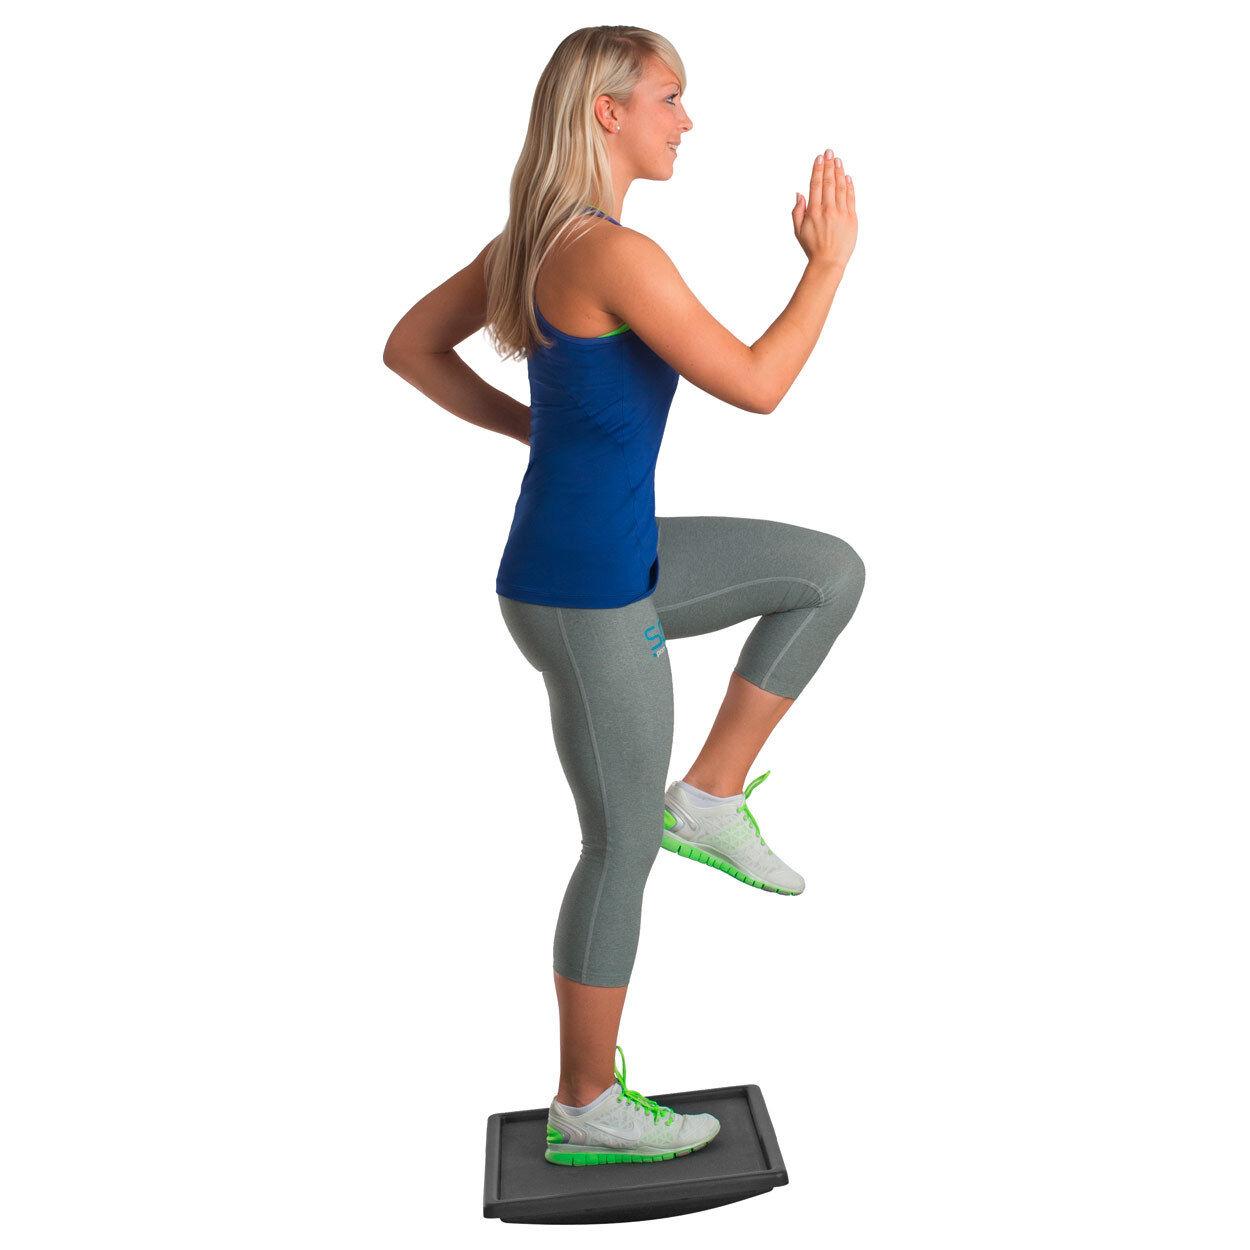 MULTISHAPE BOARD® Koordinationswippe, Koordinationstrainer, Balancetrainer